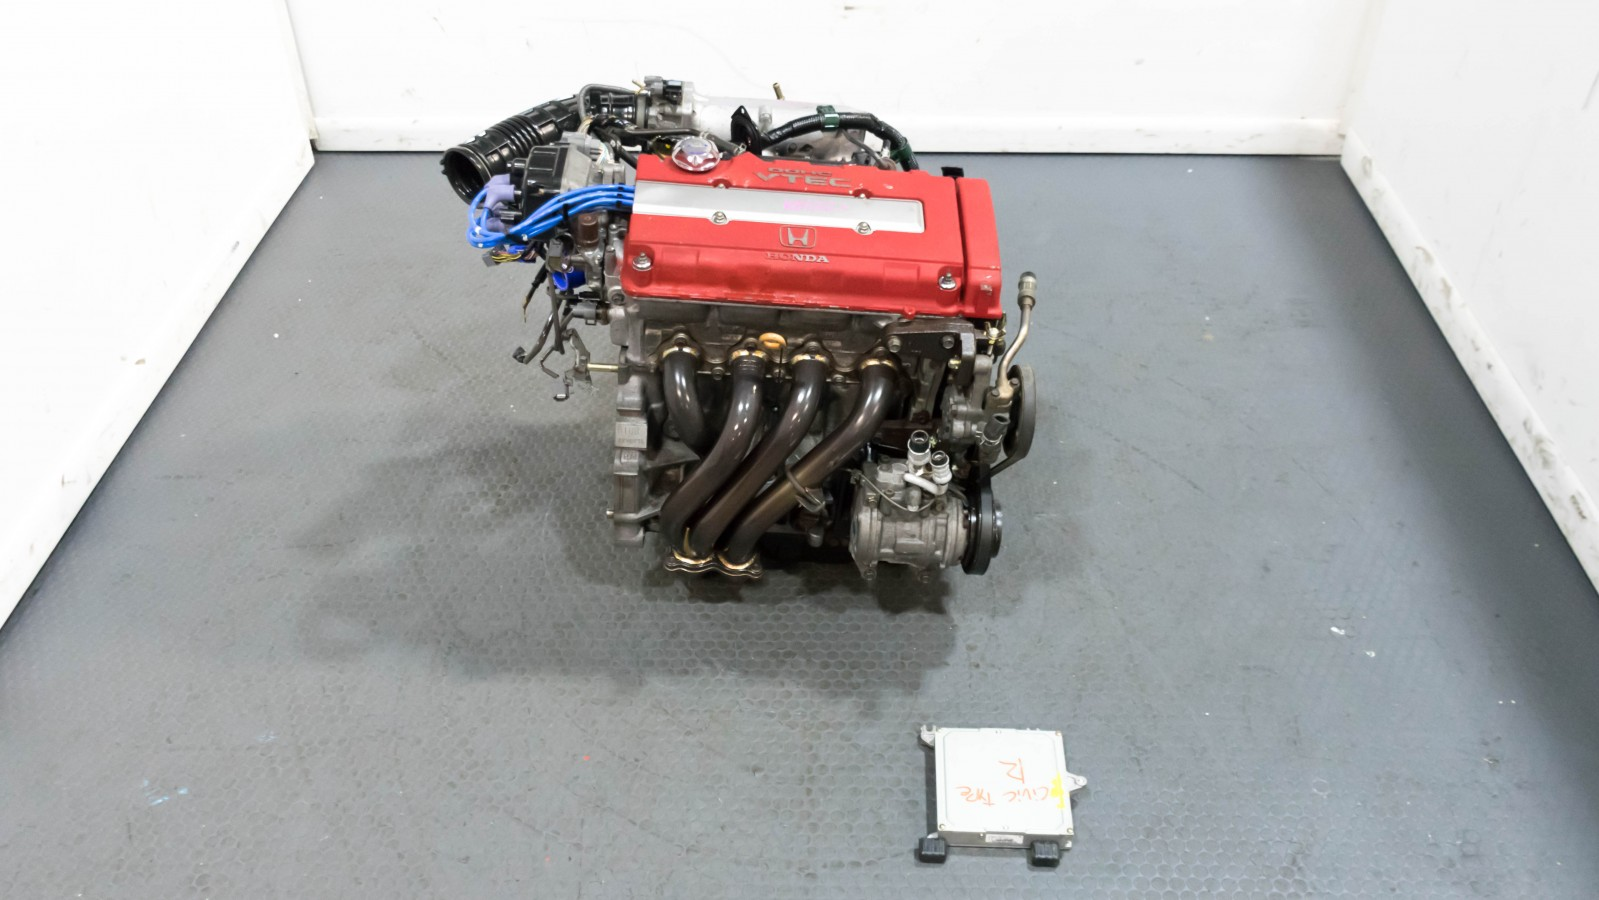 Honda B16B 2000 Spec Civic Type R Engine with Aftermarket Header and ECU